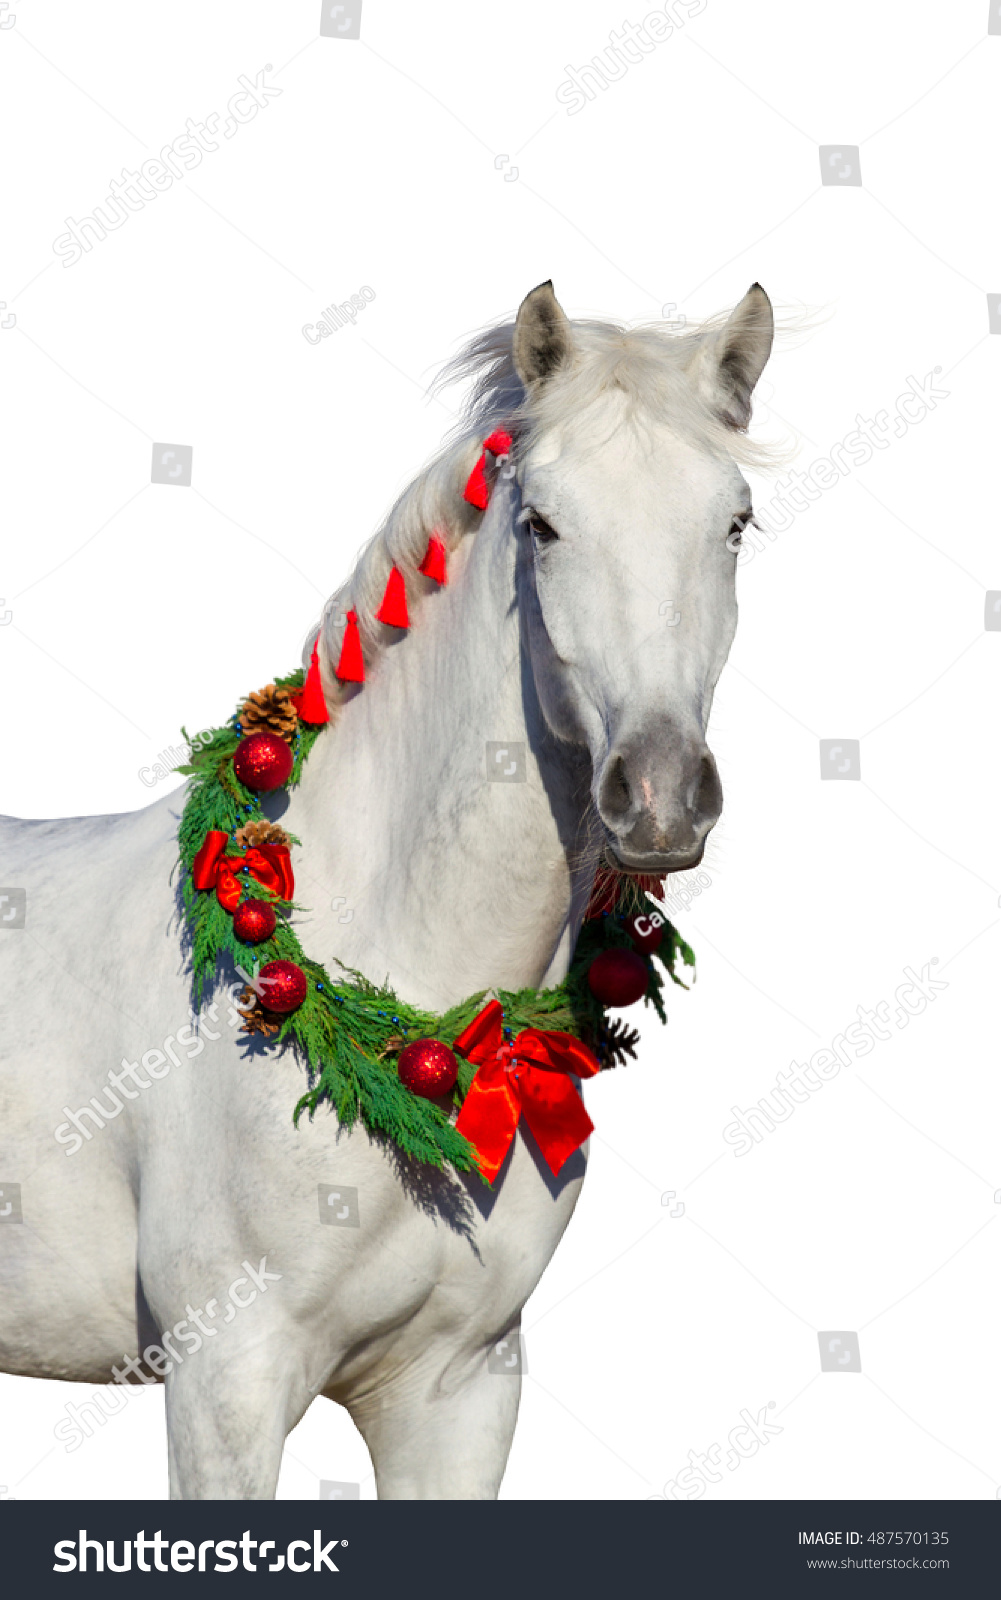 Christmas Image White Horse Wearing Wreath Stock Photo Edit Now 487570135